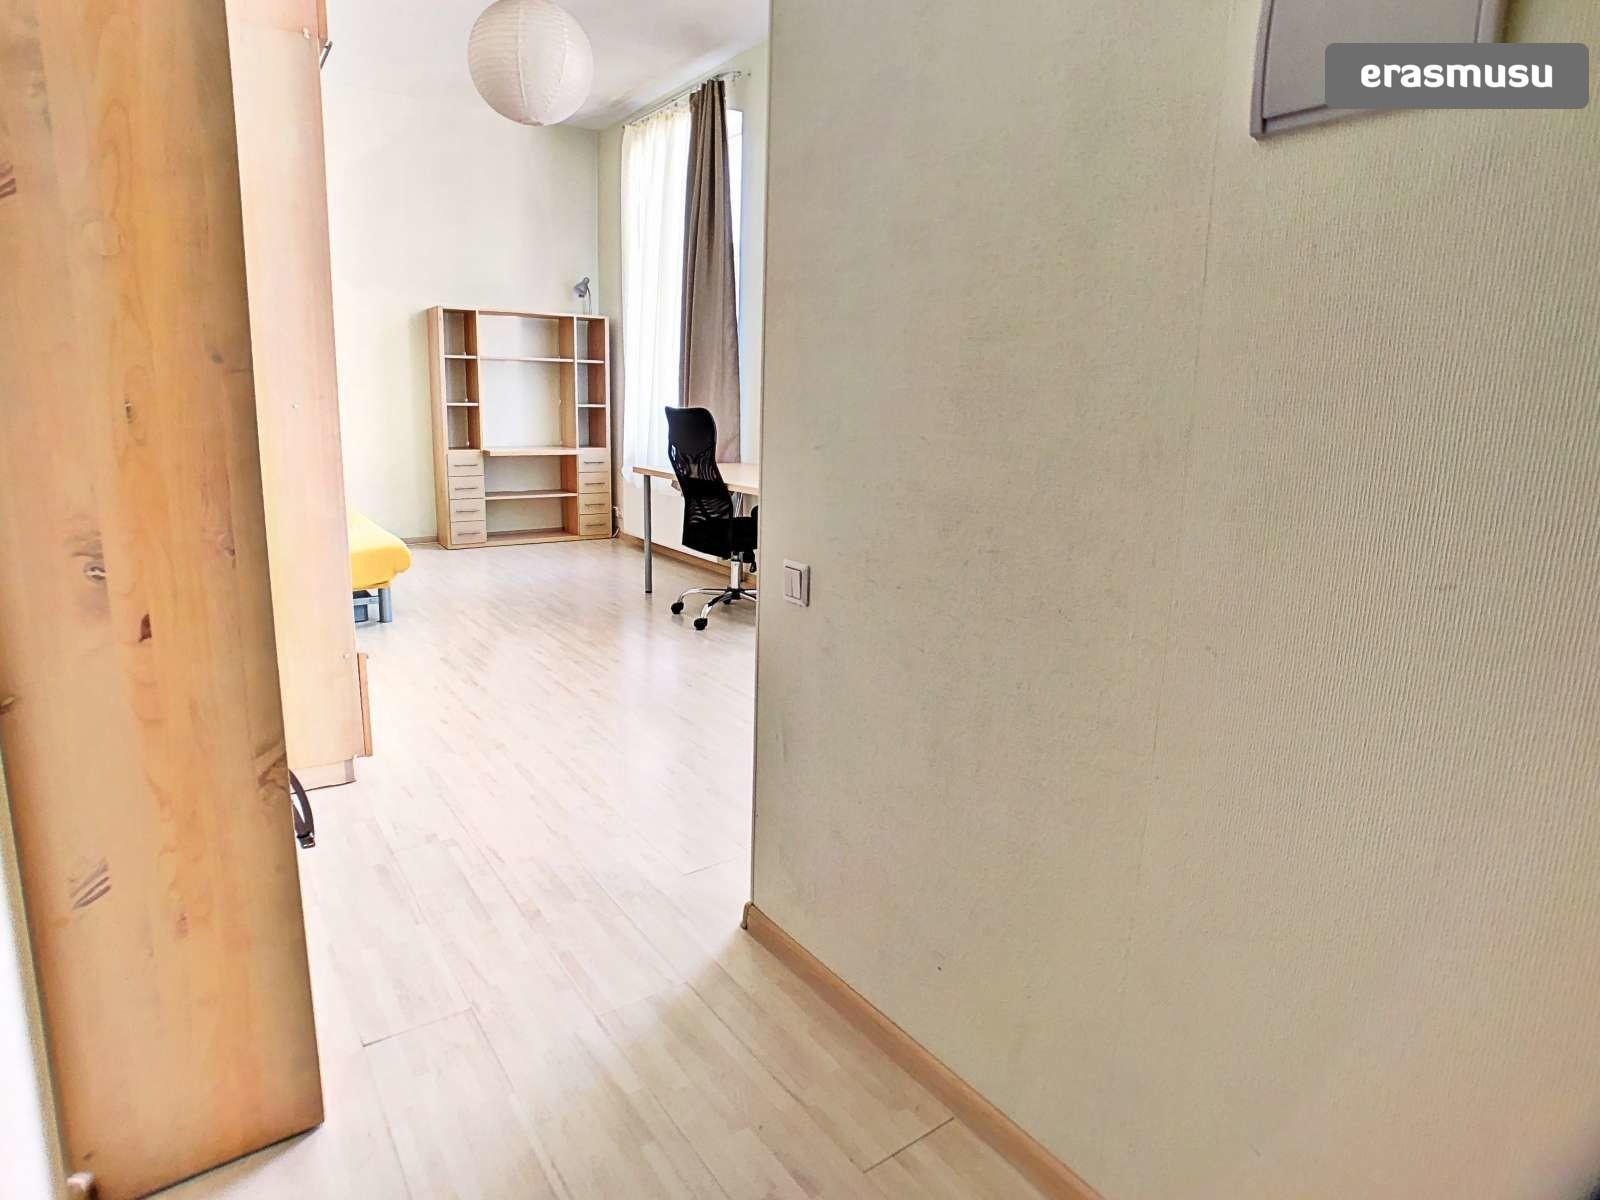 cheery-cute-studio-apartment-rent-dzirciems-329c37d58801a5e06c5c